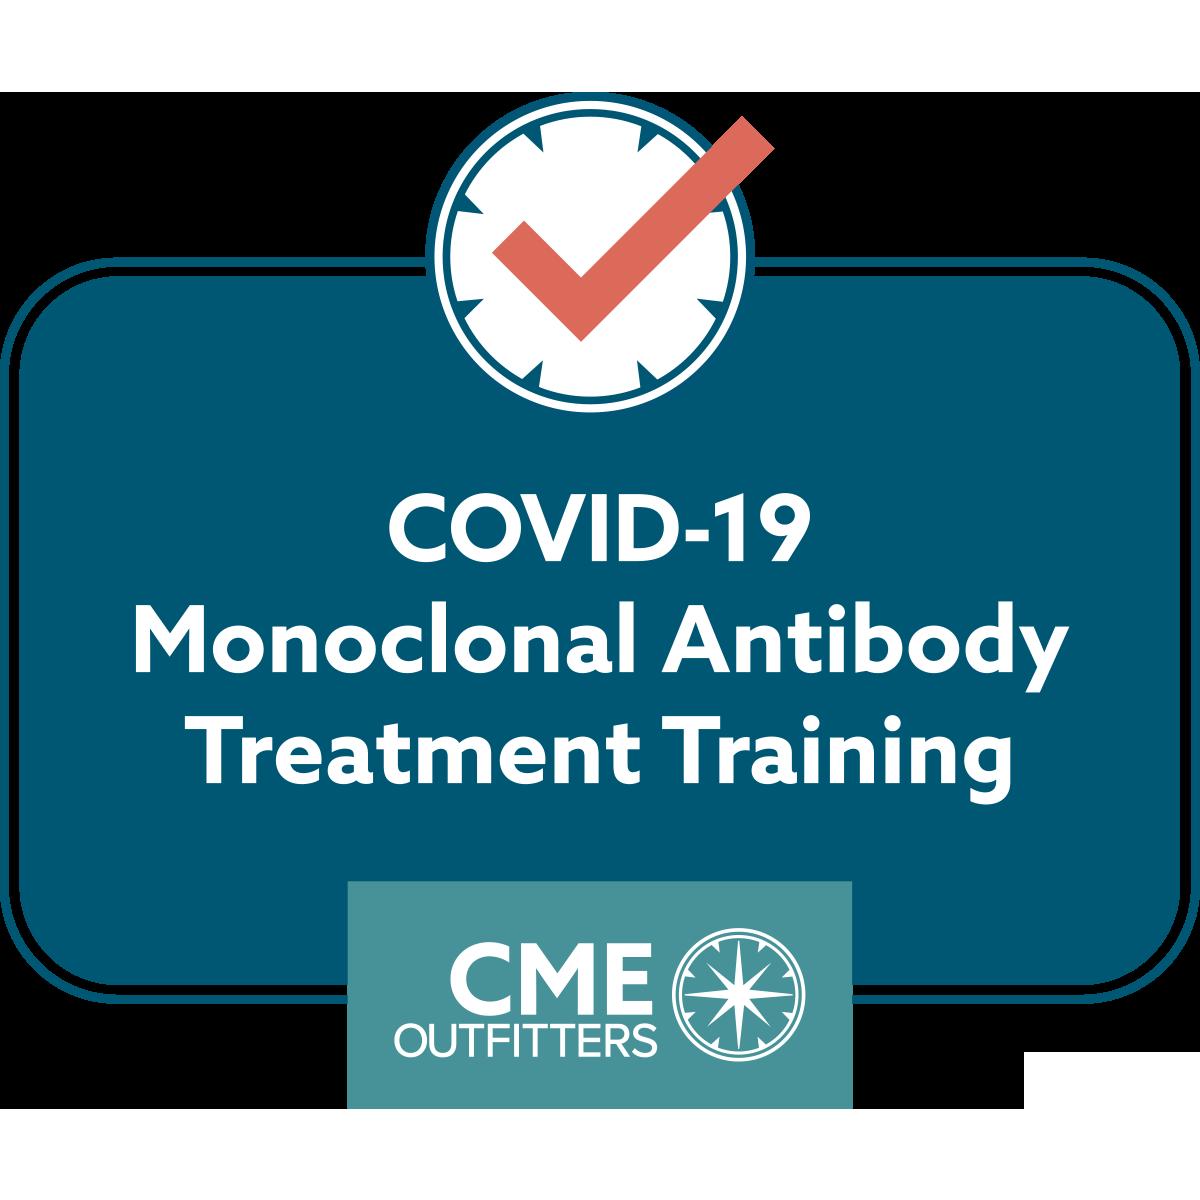 COVID-19 Monoclonal Antibody Treatment Training